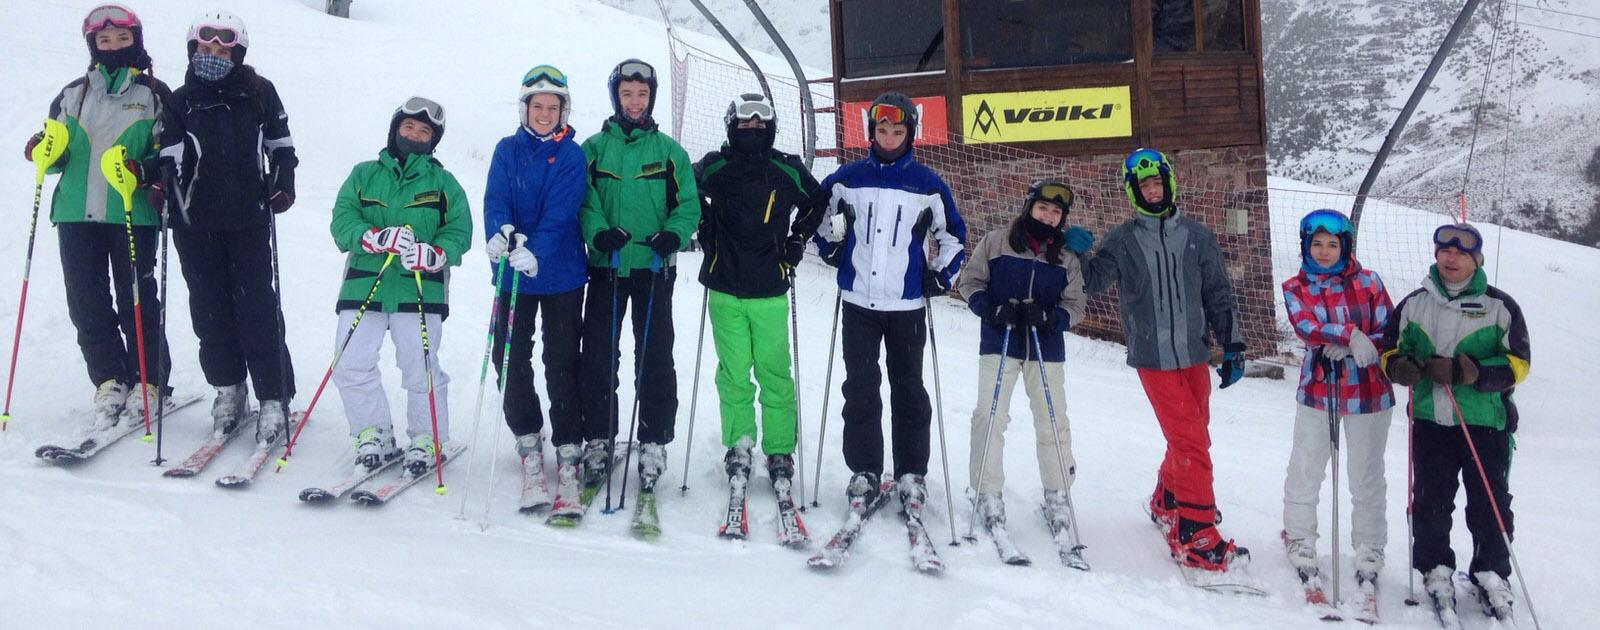 Viaje de esquí a Astún